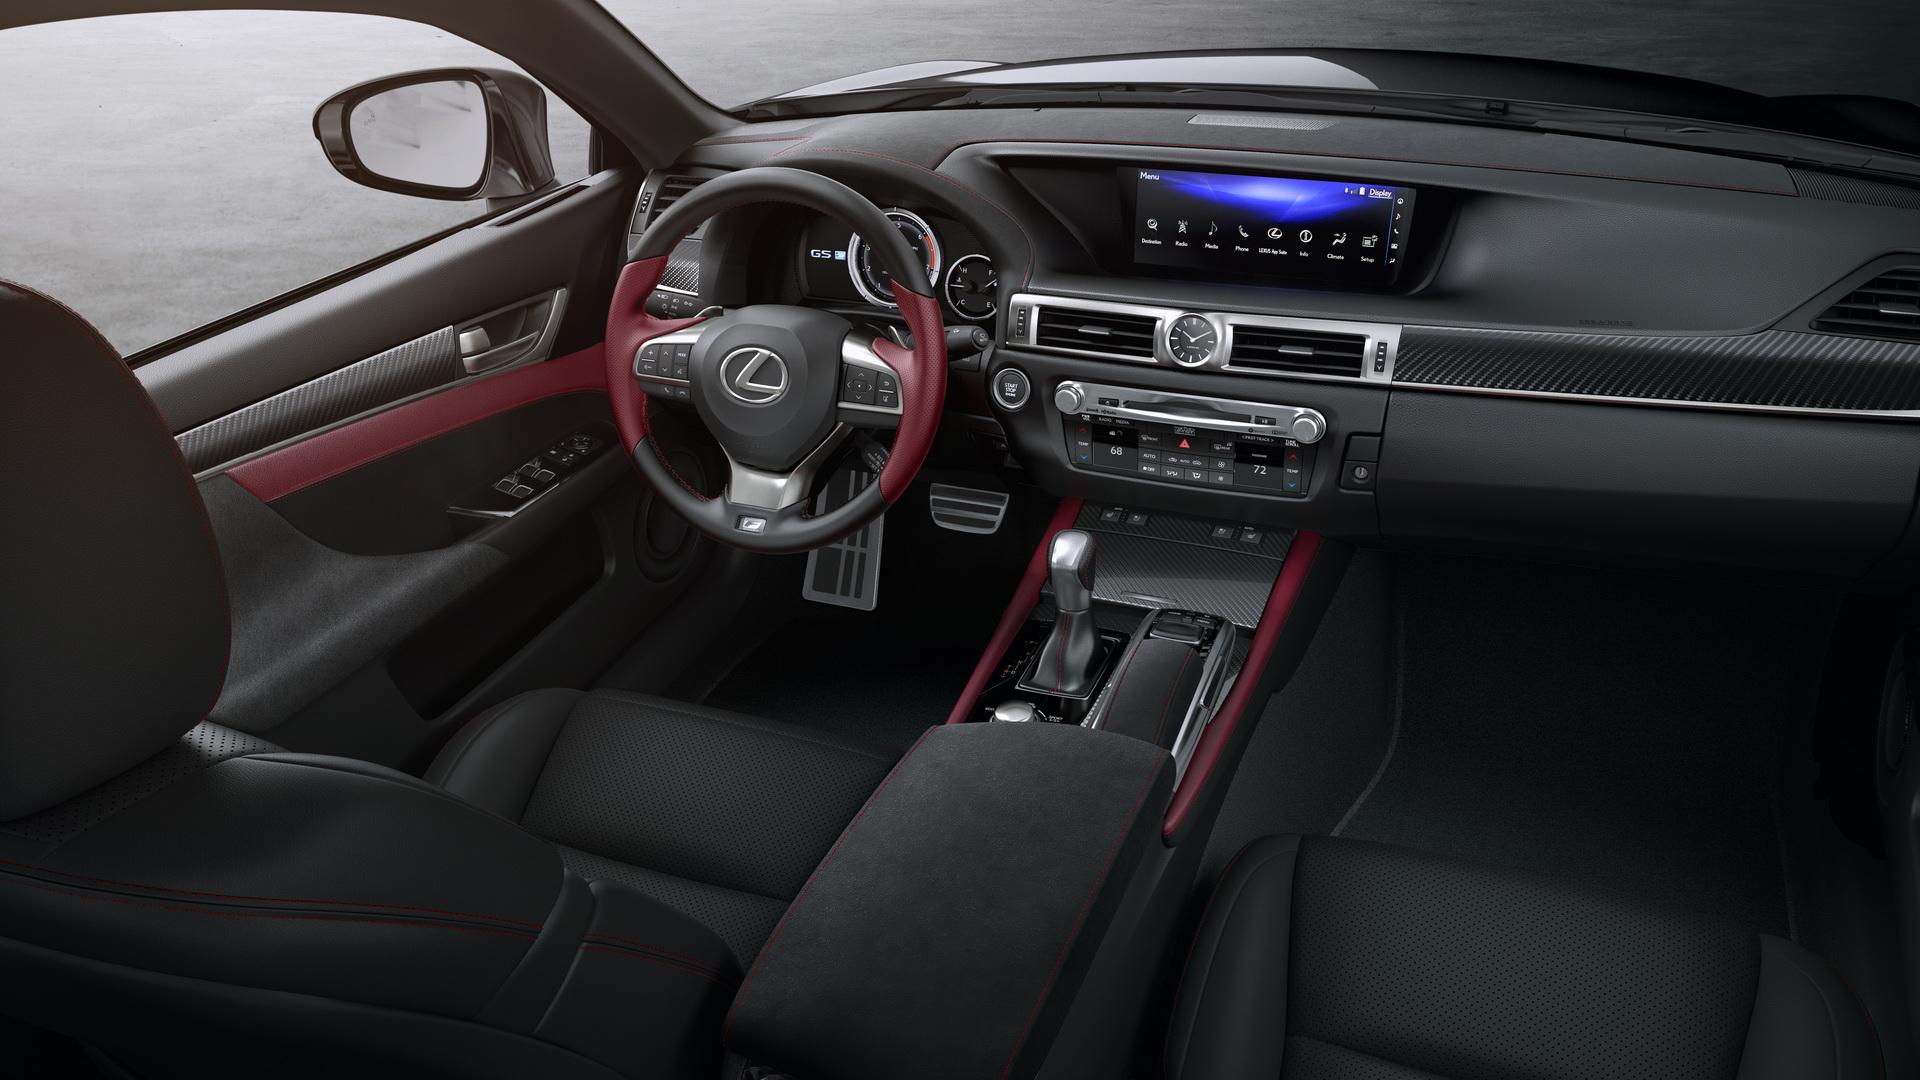 2020-lexus-gs-350-f-sport-black-line-edition-4.jpg